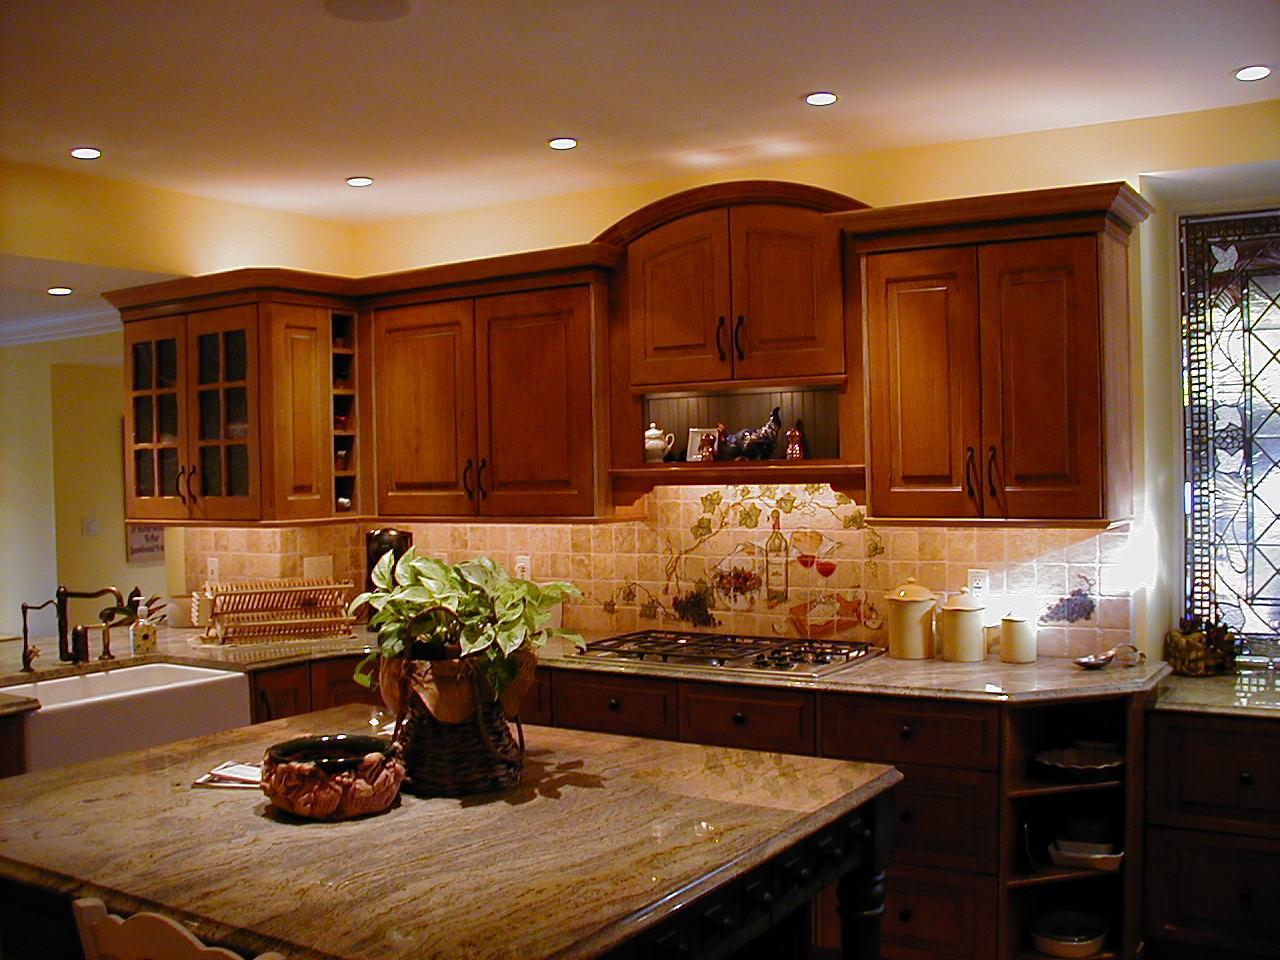 Picasa - Kitchen renovation with custom cabinets and granite countertops.jpg